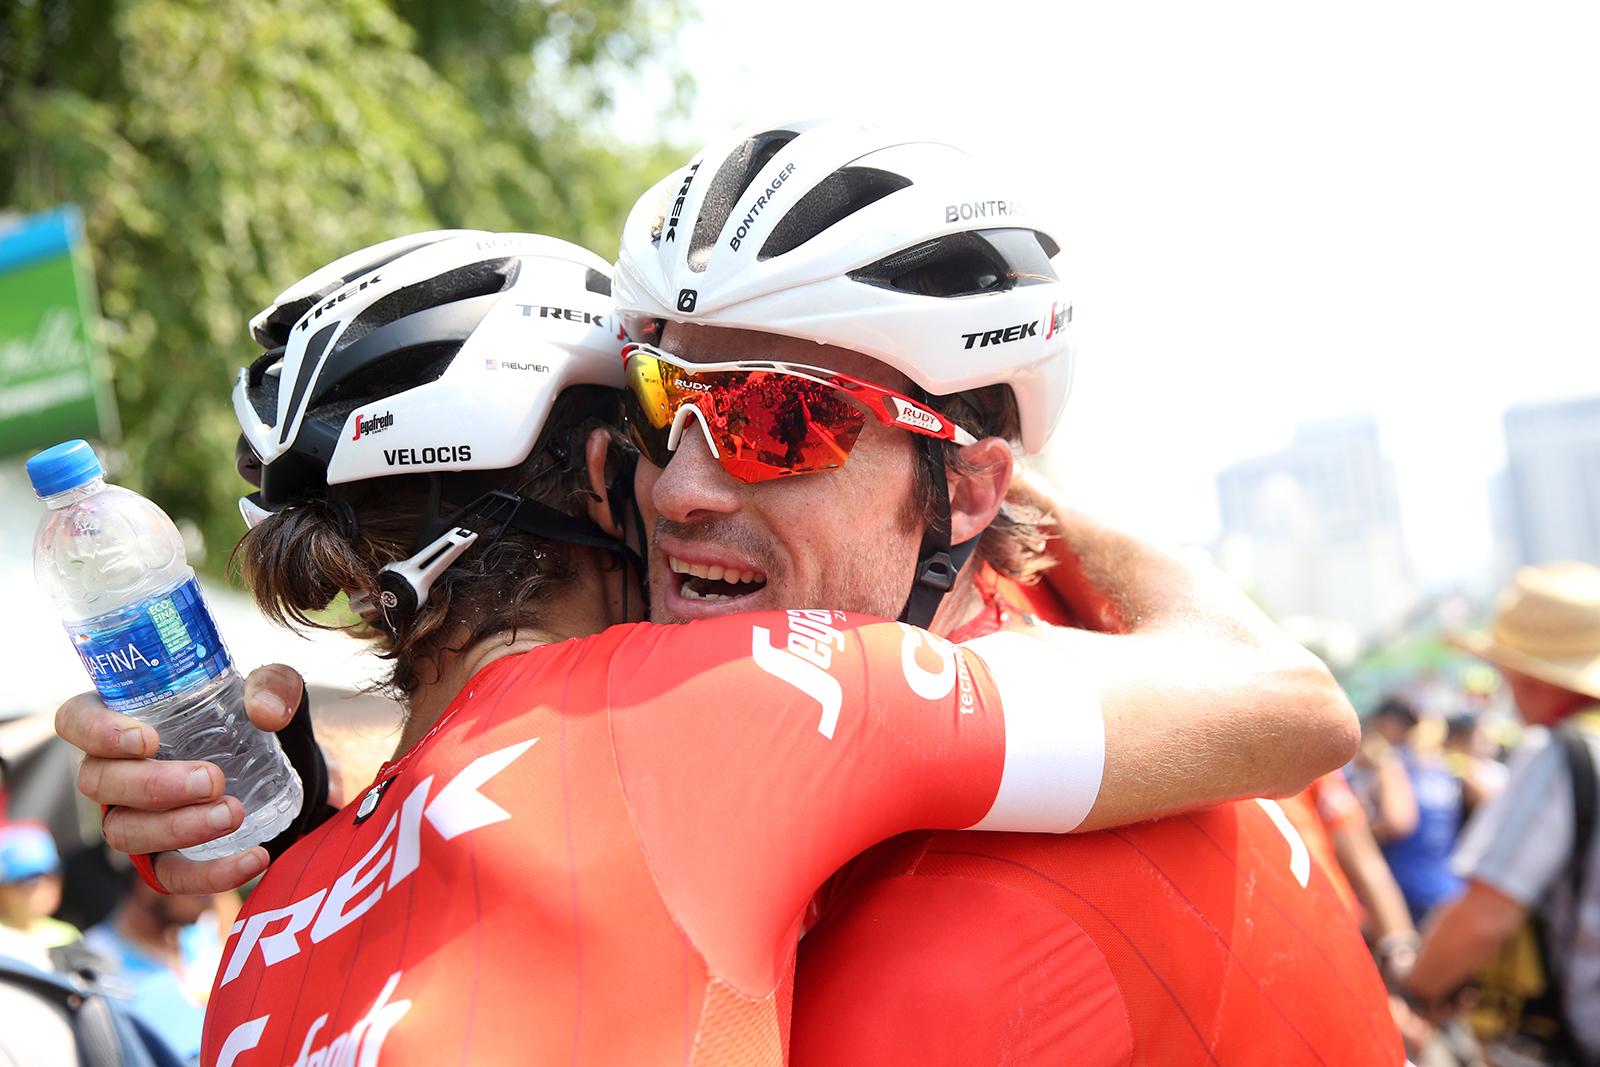 Trek Segafredo celebrates 3rd place. 2018 Tour of Utah Stage 4, August 8, 2018, Salt Lake City, Utah. Photo by Cathy Fegan-Kim, cottonsoxphotography.net